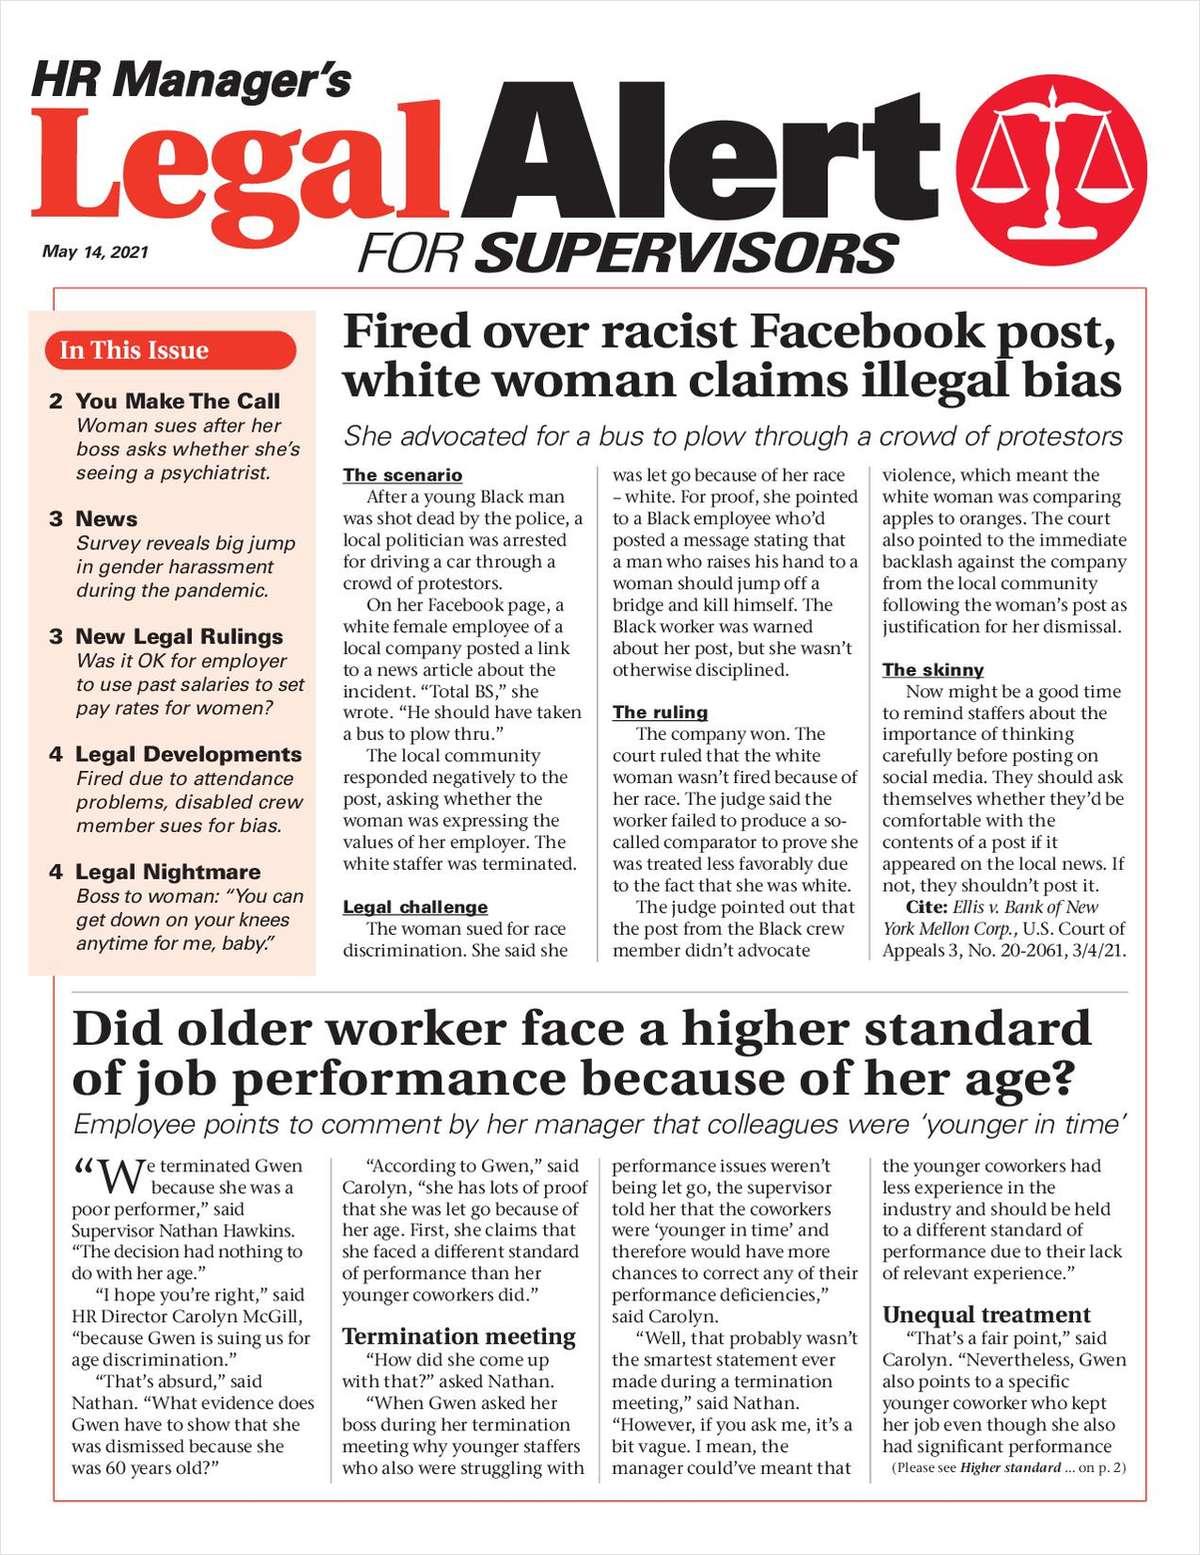 HR Manager's Legal Alert for Supervisors Newsletter: May 14 Edition